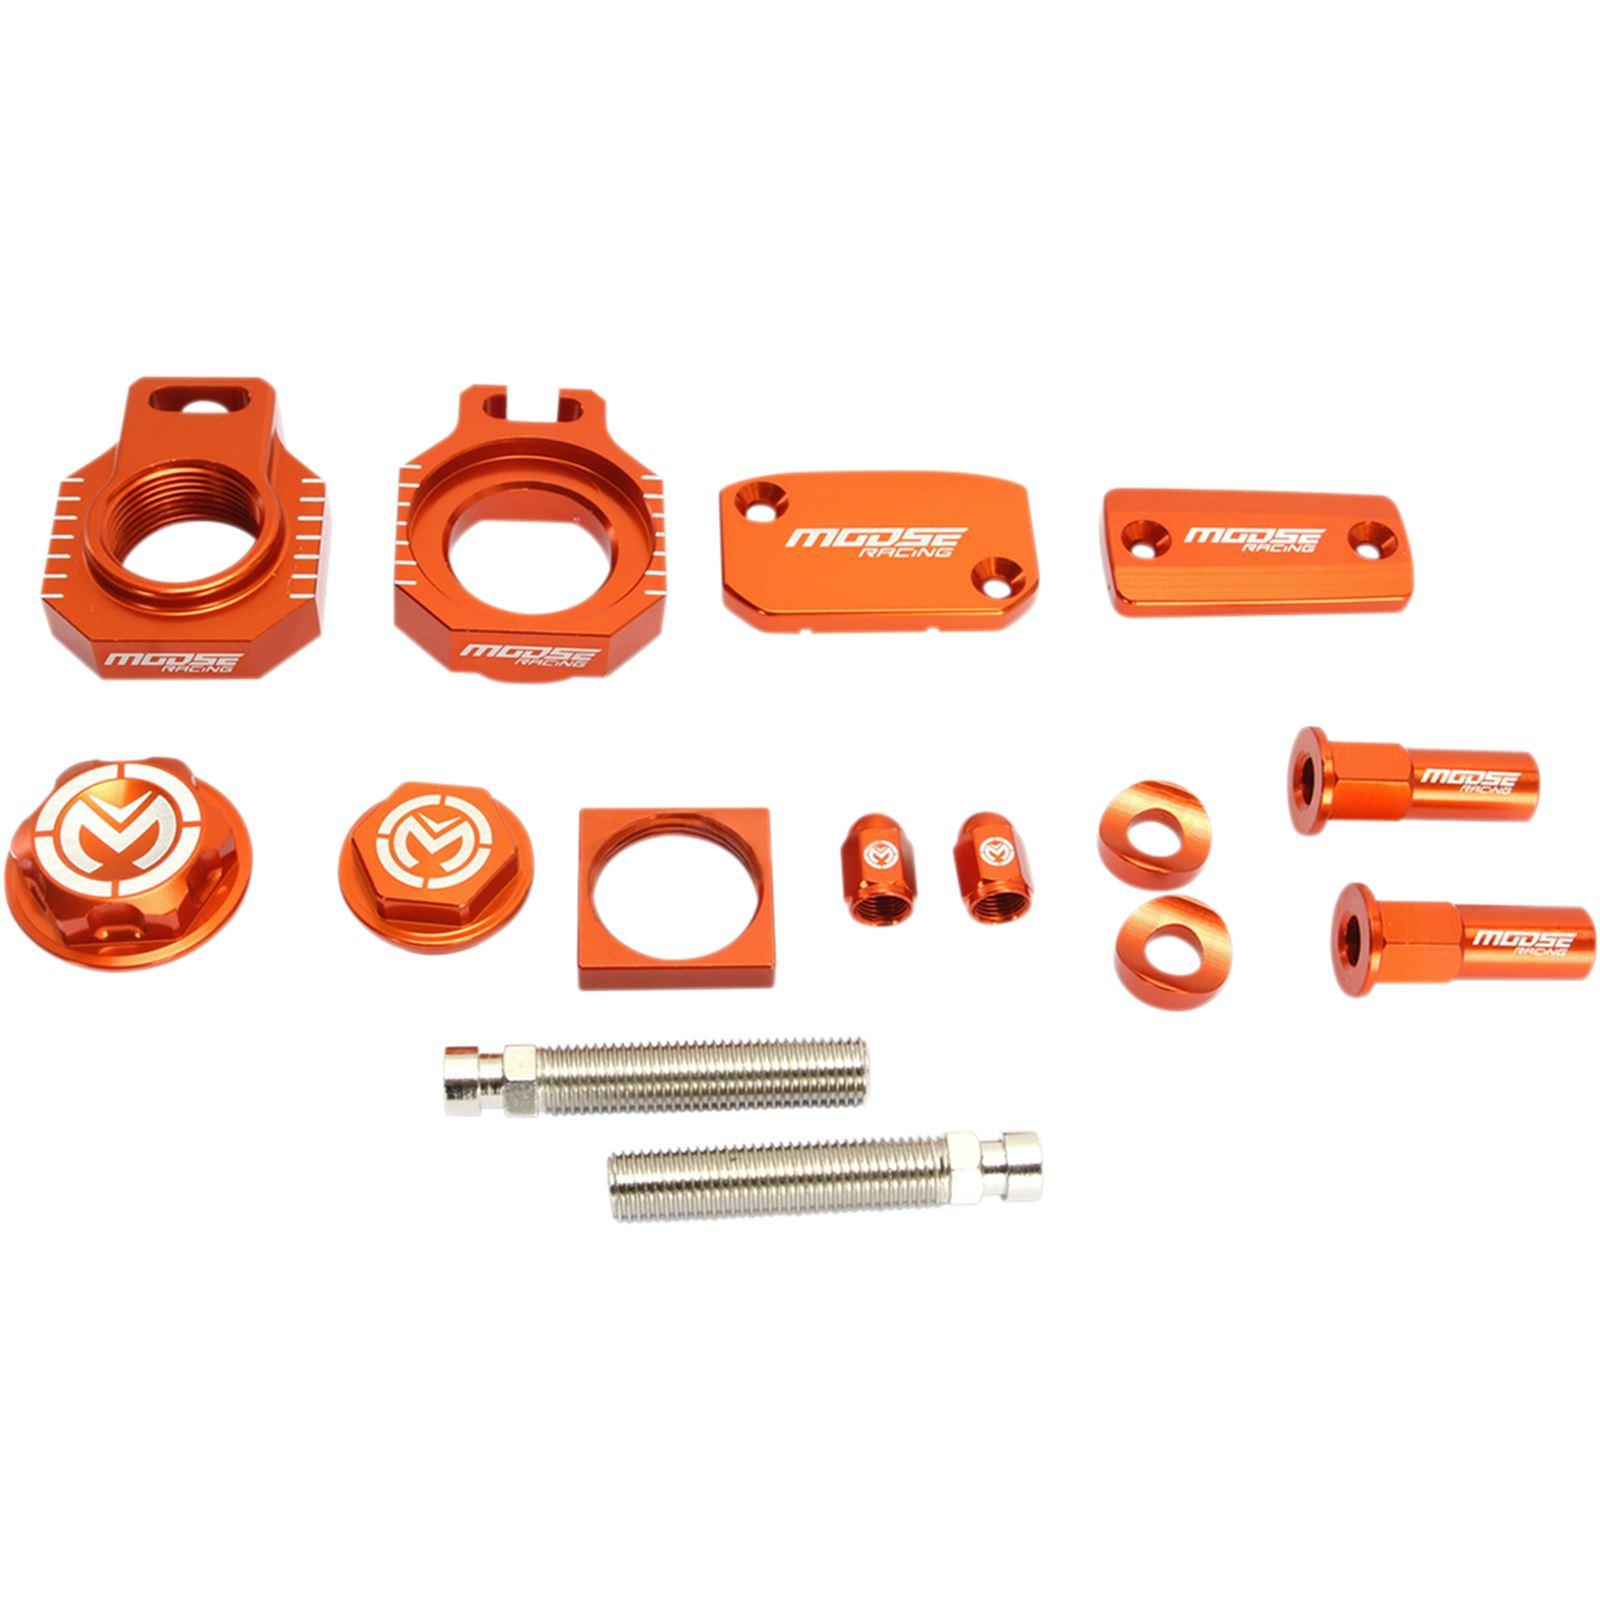 Moose Racing Bling Packs - KTM - Orange